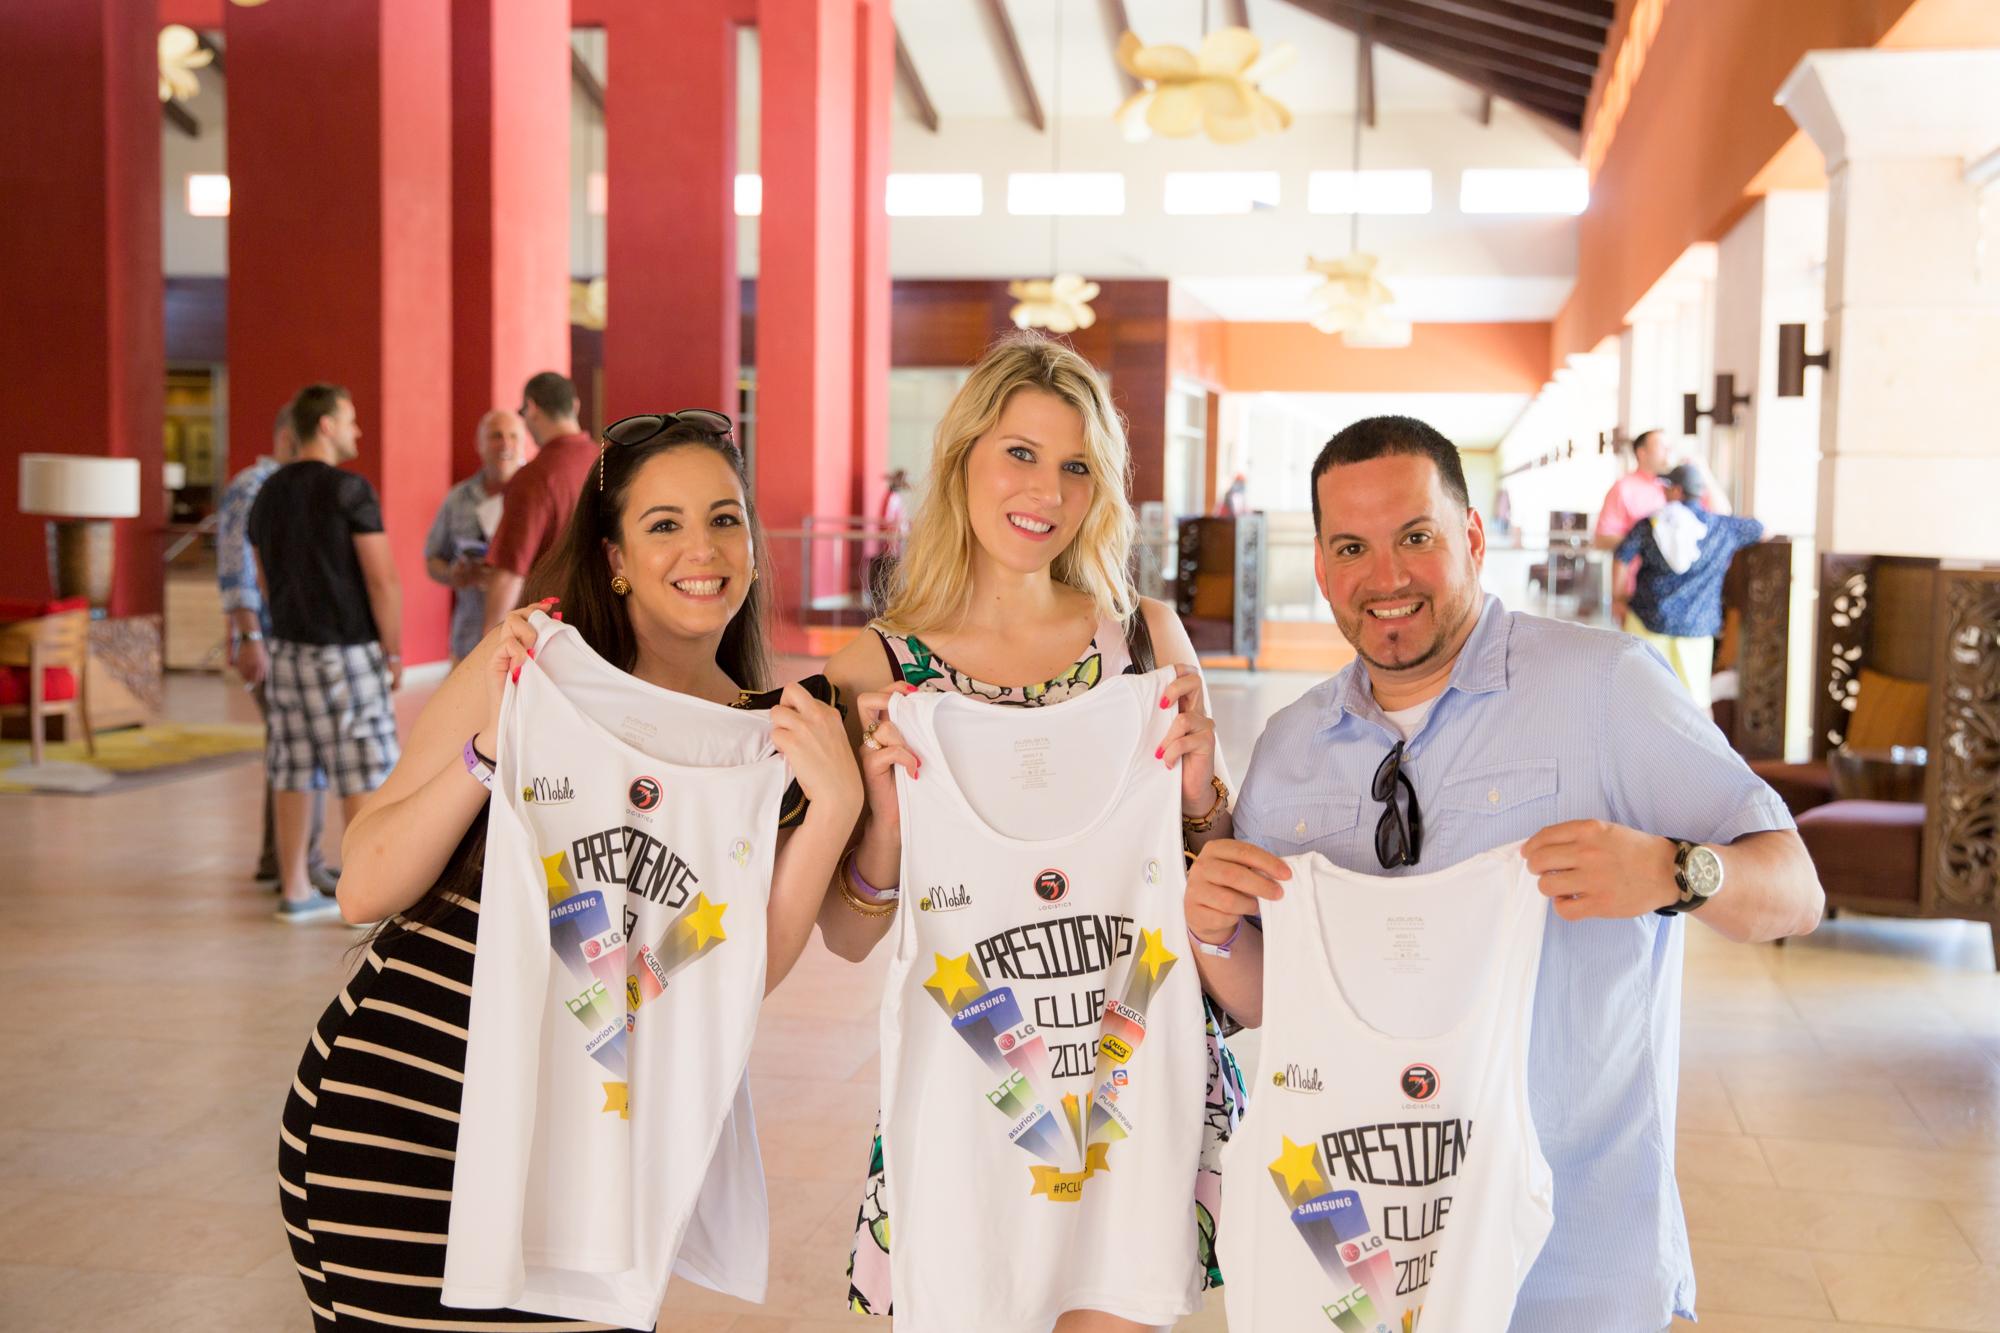 AWI President's Club 2015 (Punta Cana, Dominican Republic  )